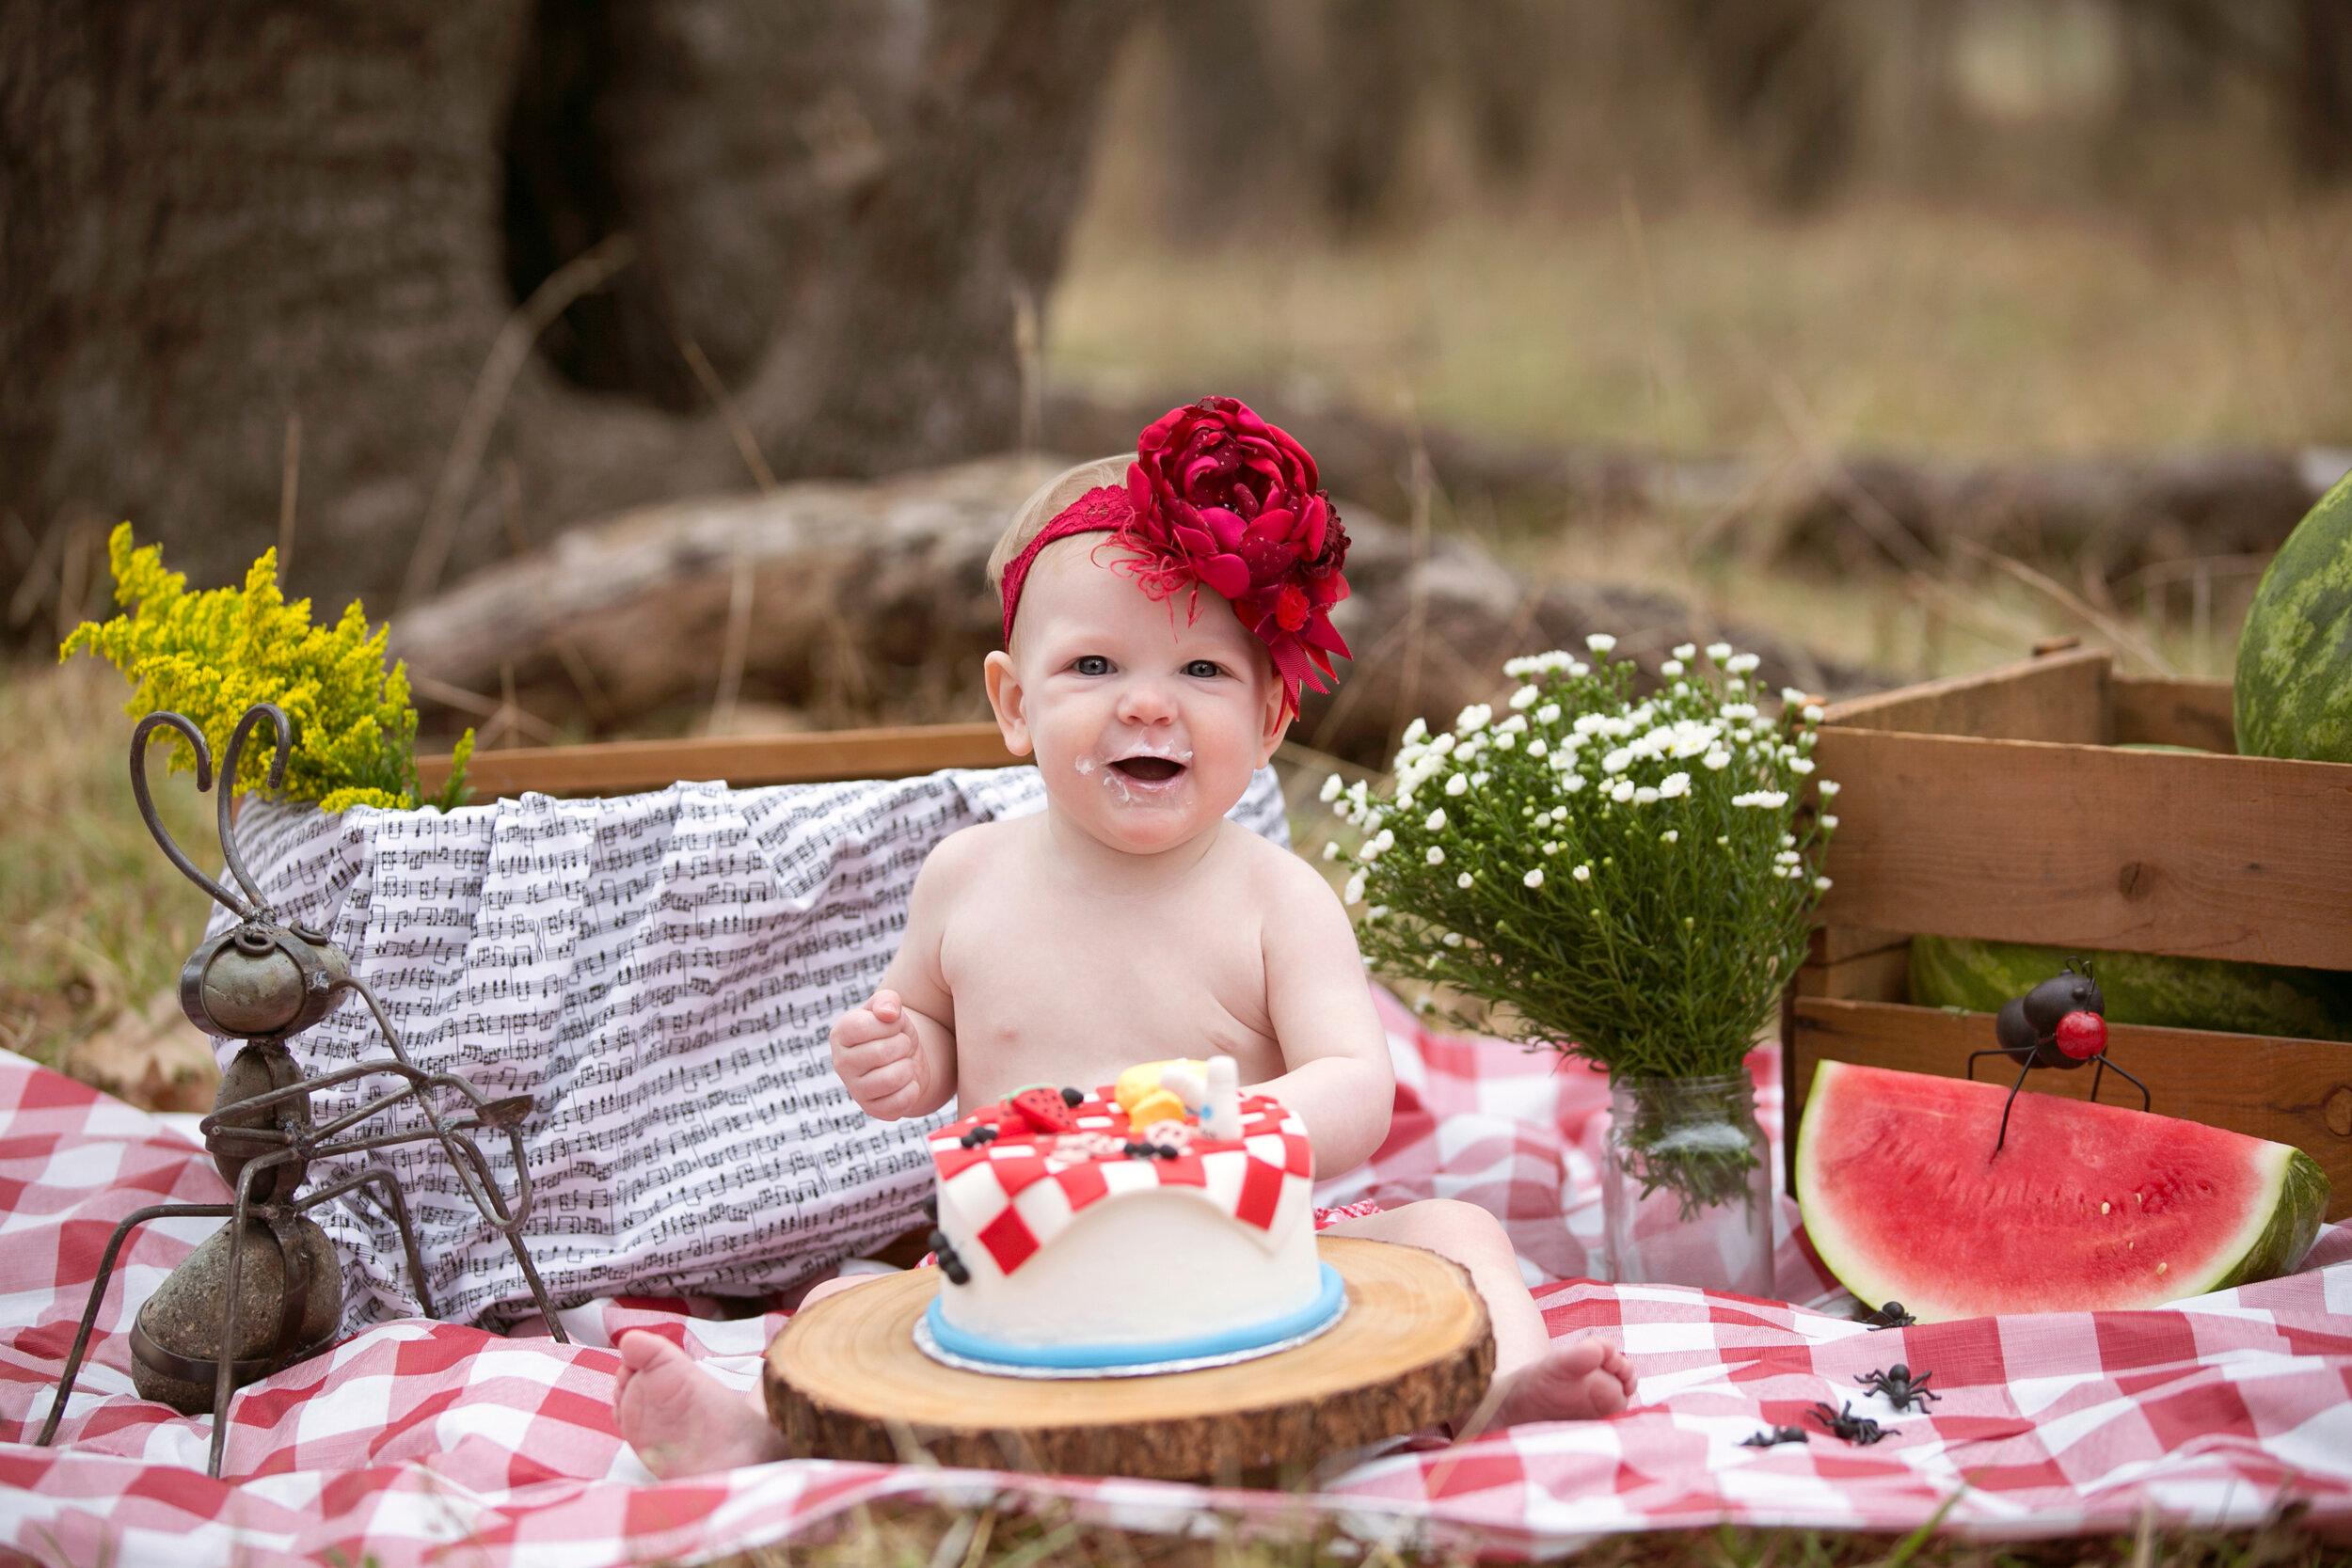 watermelon-summer-picnic-cake-smash-lytle-san-antonio-texas-photographer.jpg